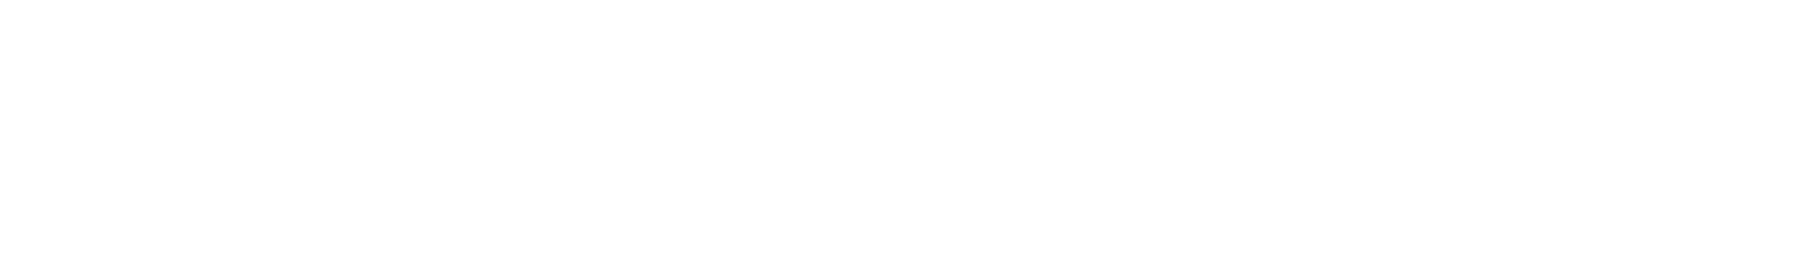 106857 electro loop 132 bpm wav